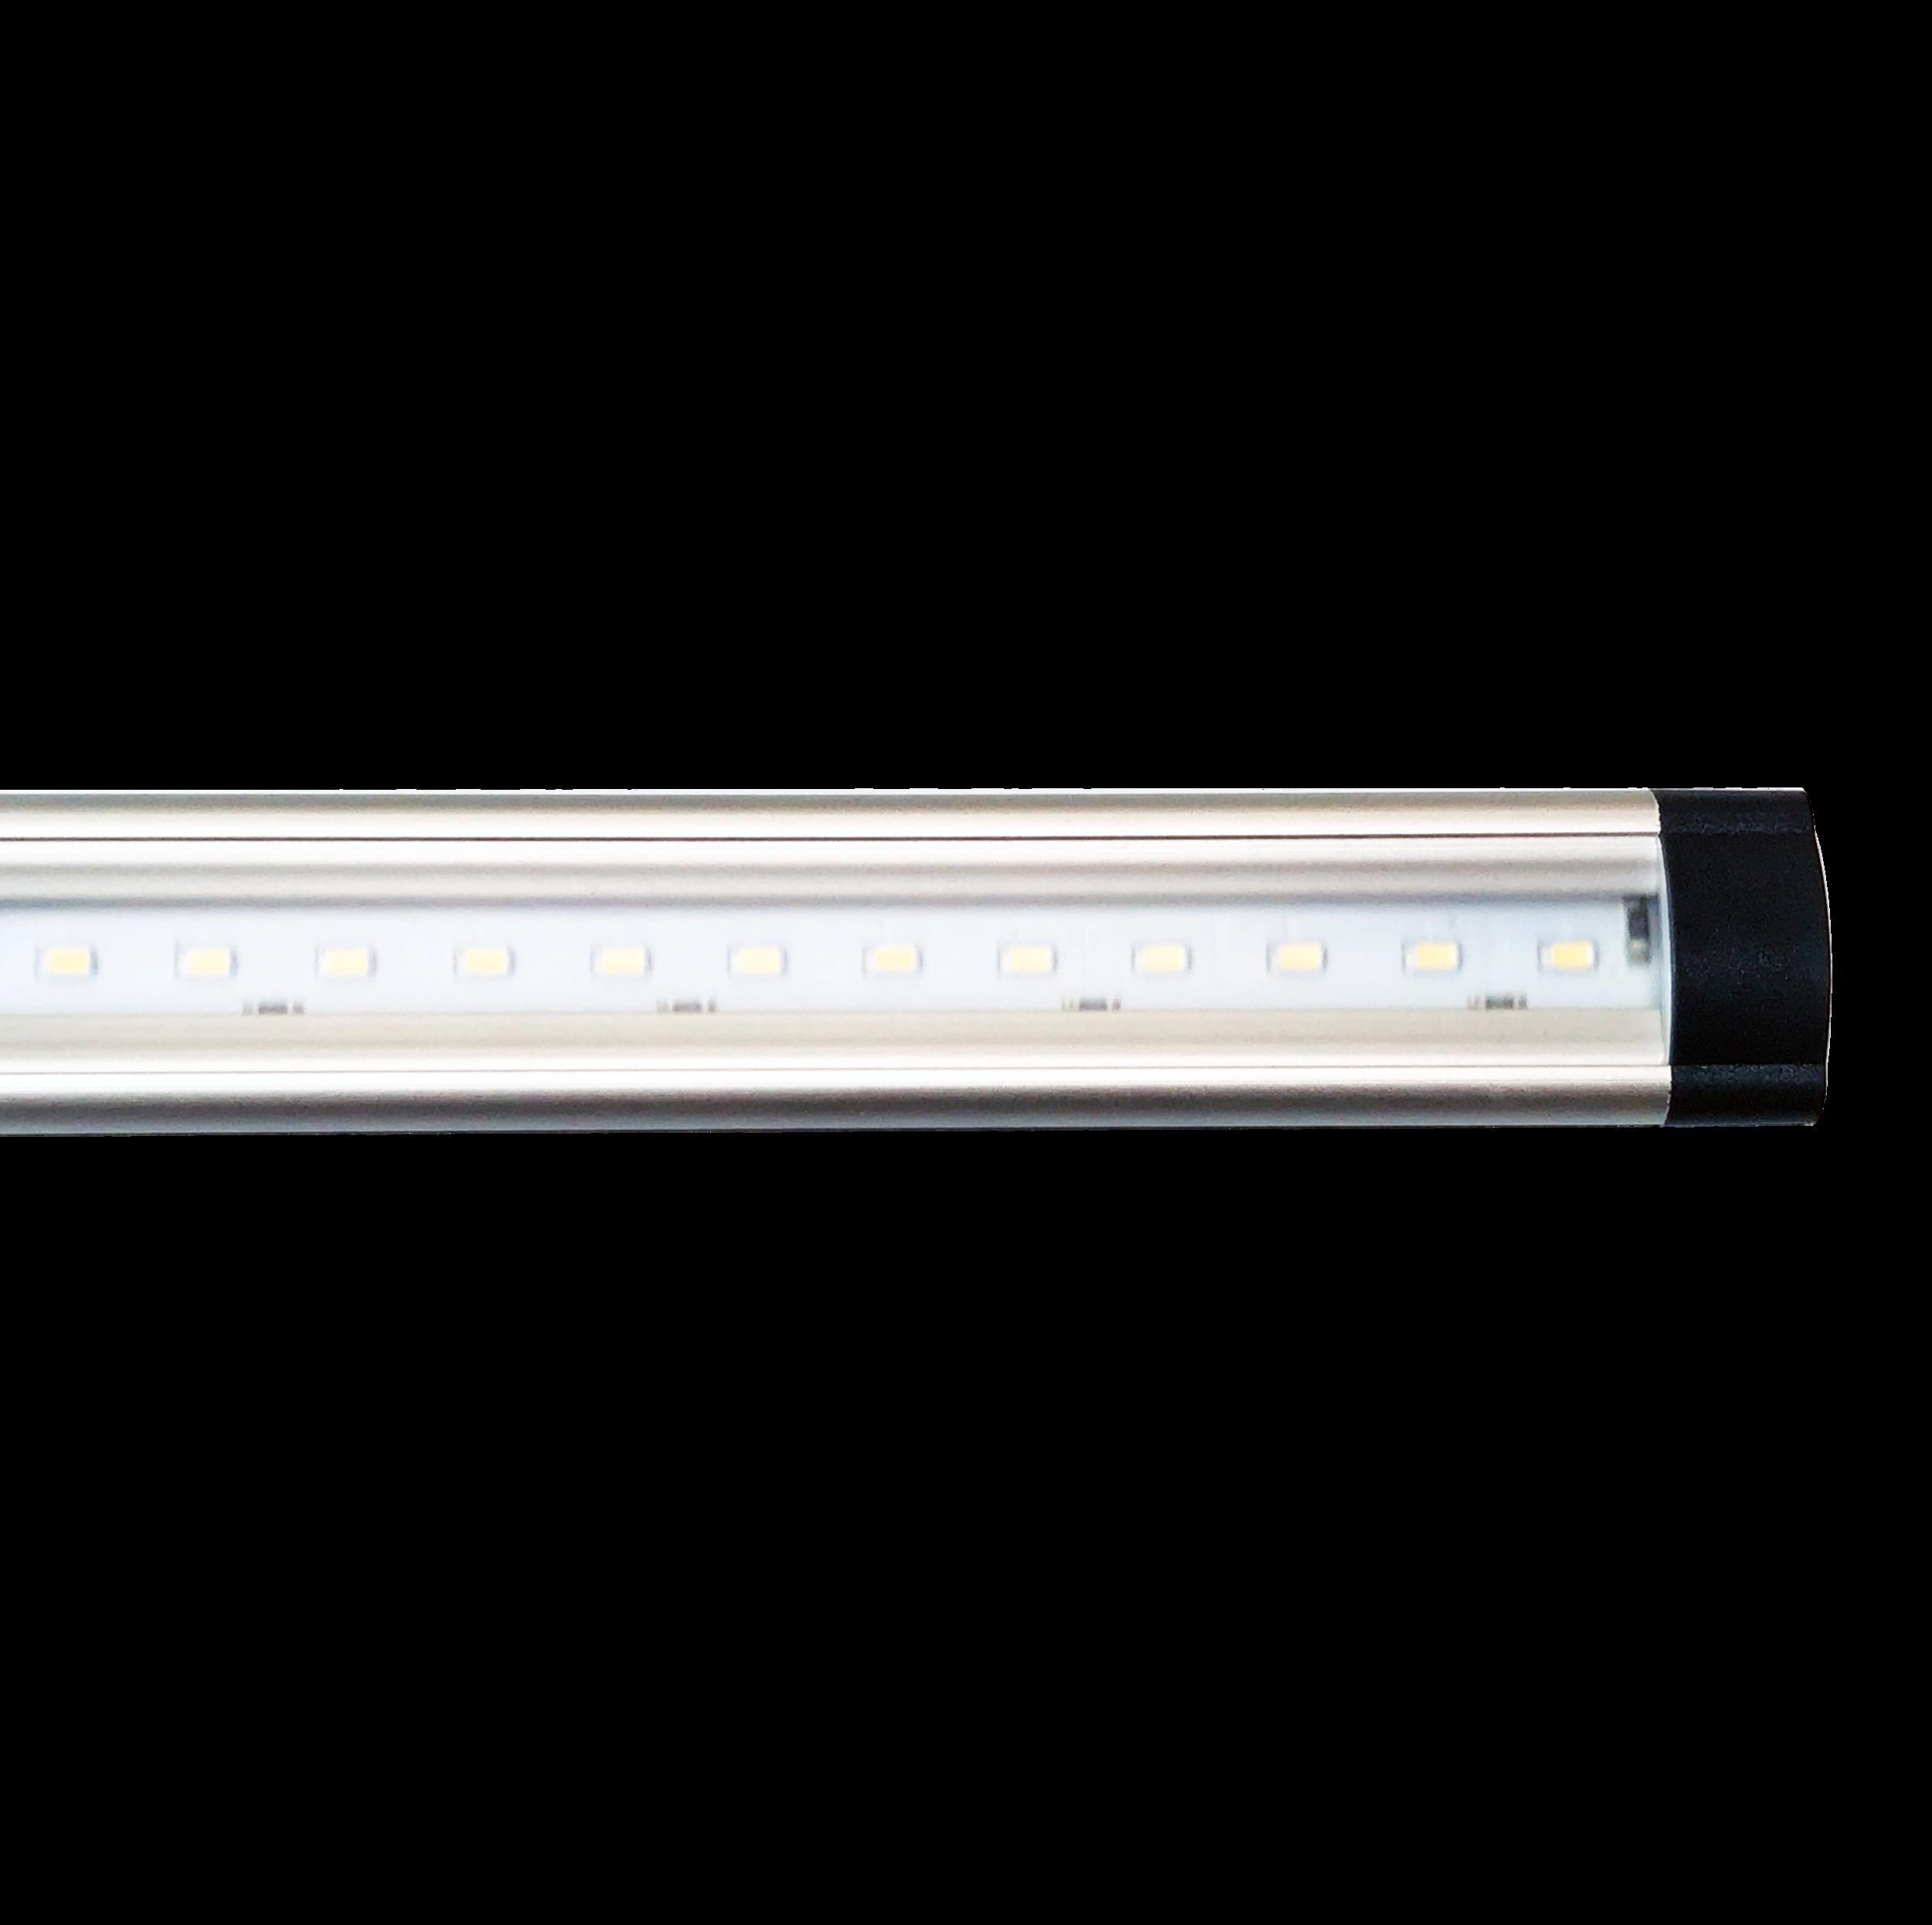 Lumiram Cree Led Strip Light Kit 24 36 Healthlighting